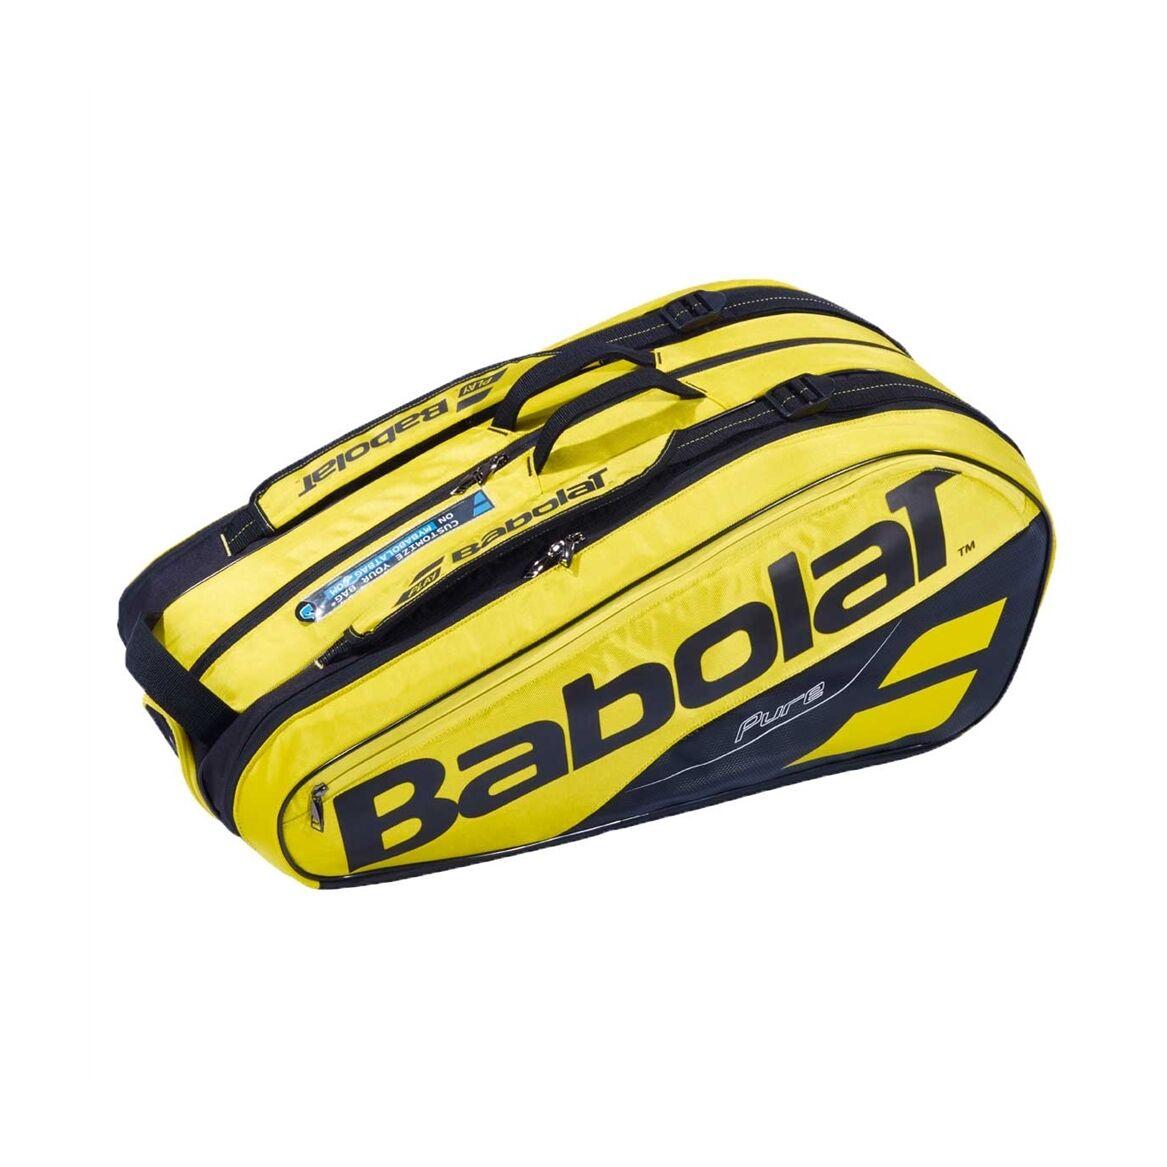 Babolat RH x9 Pure Aero 2019